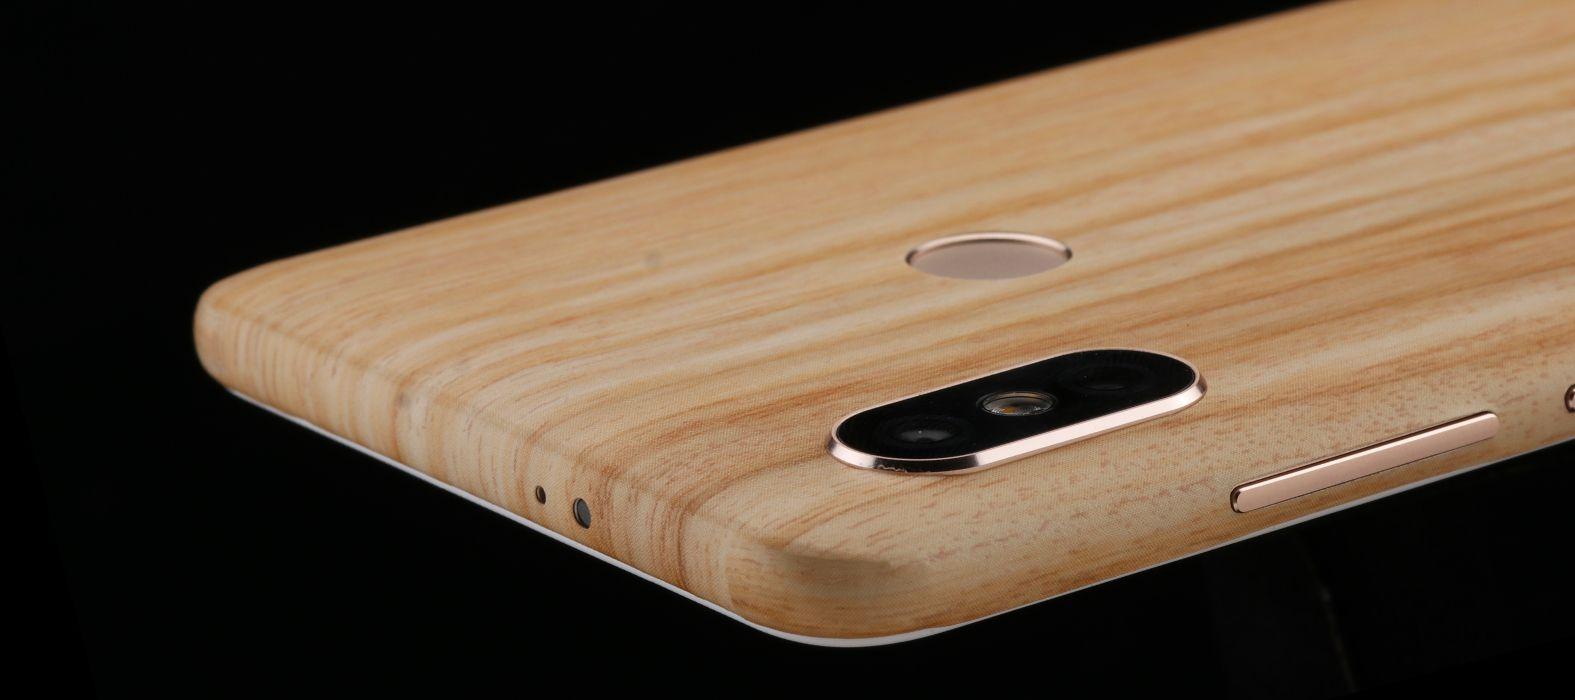 Xiaomi Redmi 6 Pro Bamboo Wood Skins